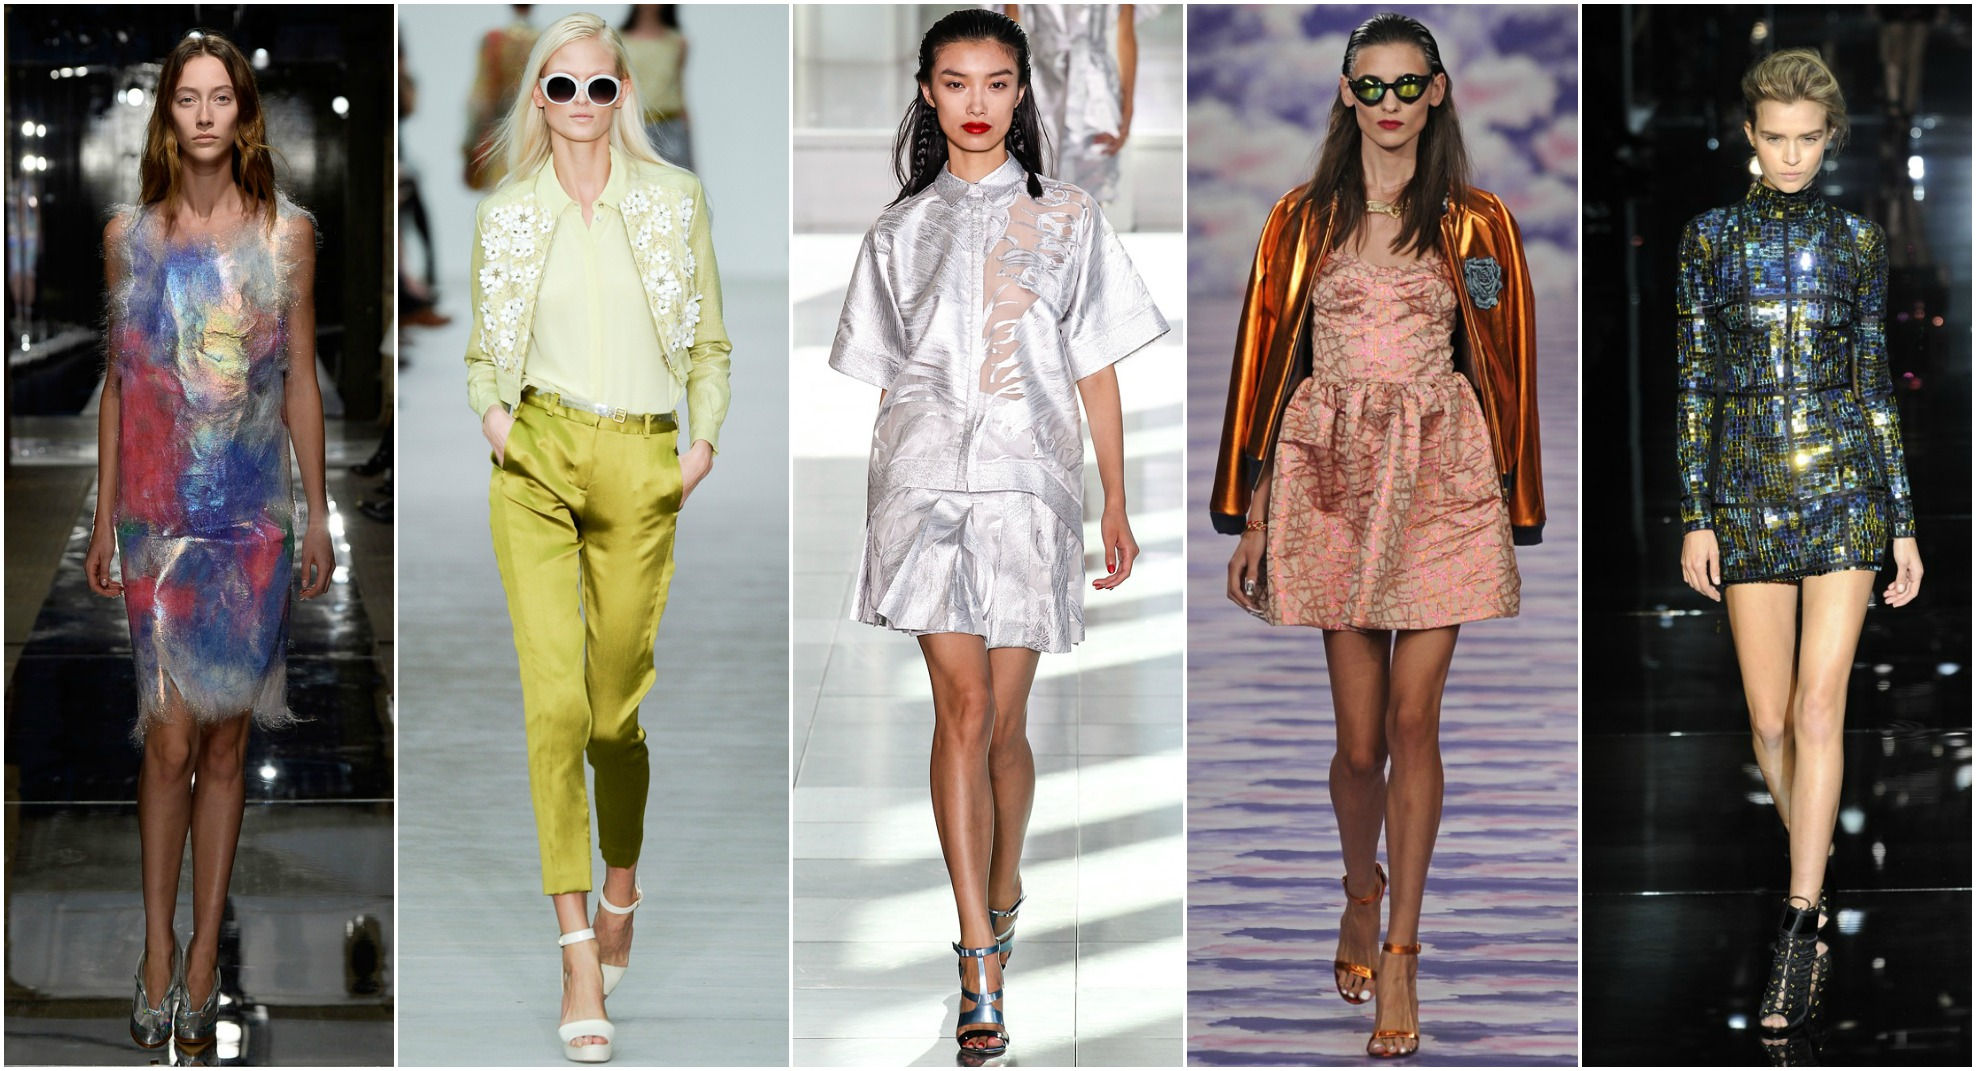 Future fashion trends 2014 - Thursday March 27 2014